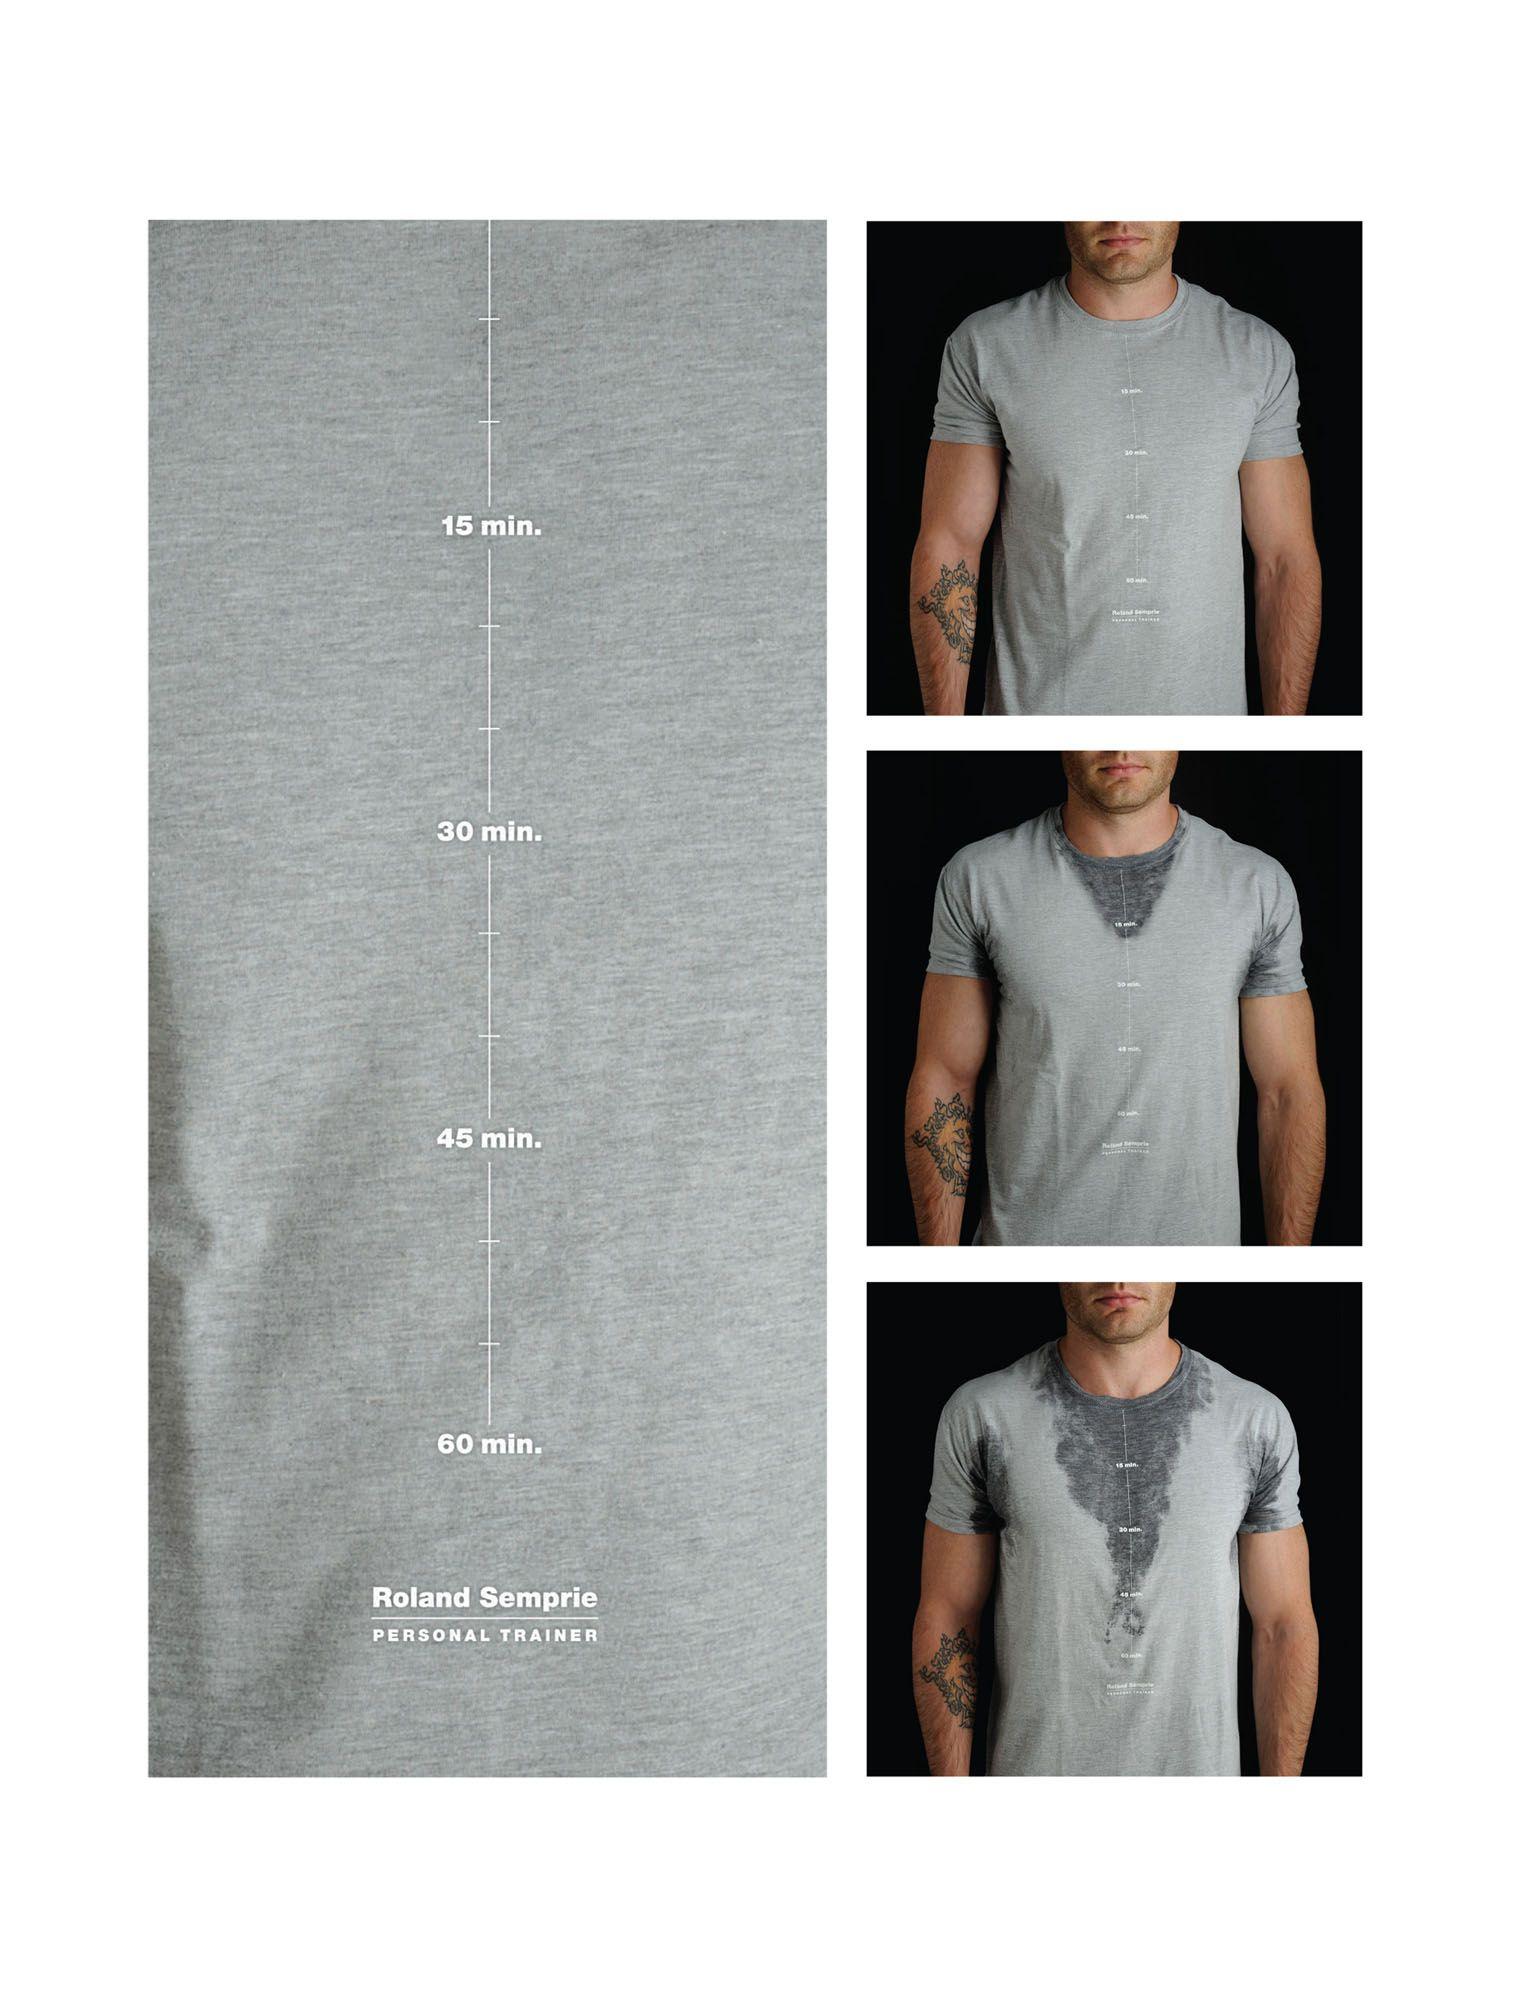 Shirt design toronto - Advertising Agency Gjp Advertising Design Toronto Canada Chief Creative Officer Alan Gee Creative Directors Lisa Greenberg Trevor Schoenfeld